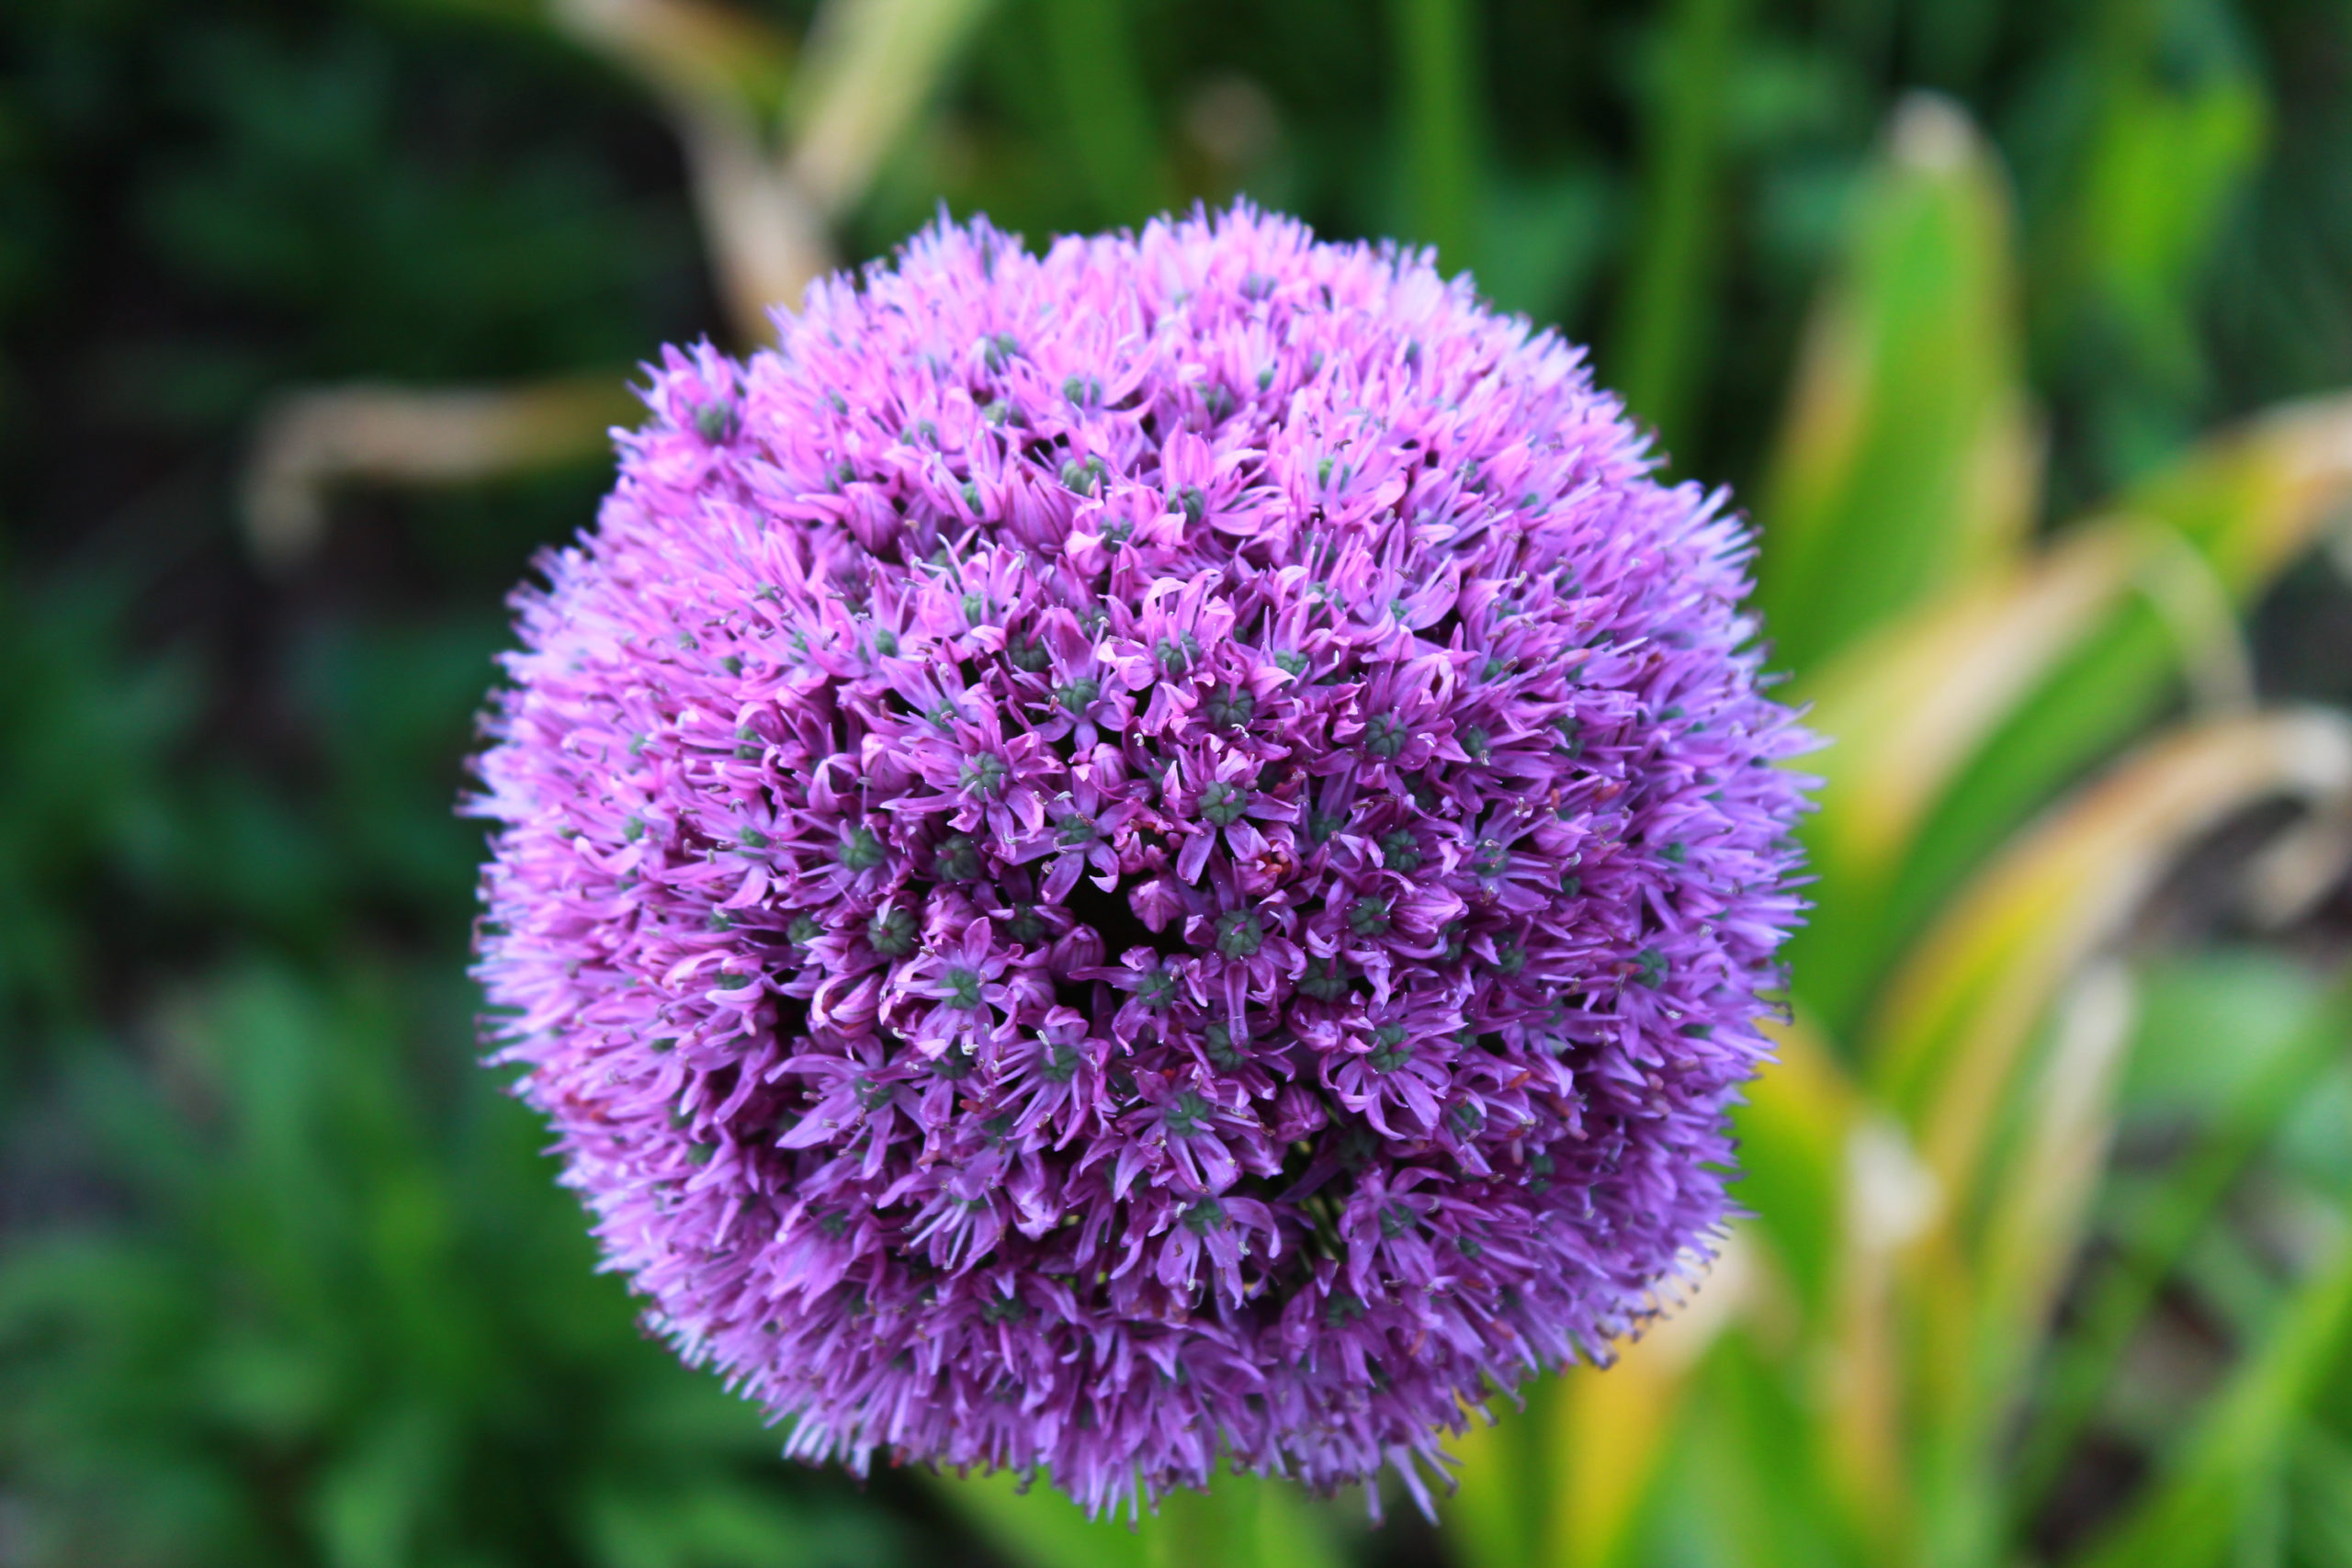 fioletowy kwiat czosnku